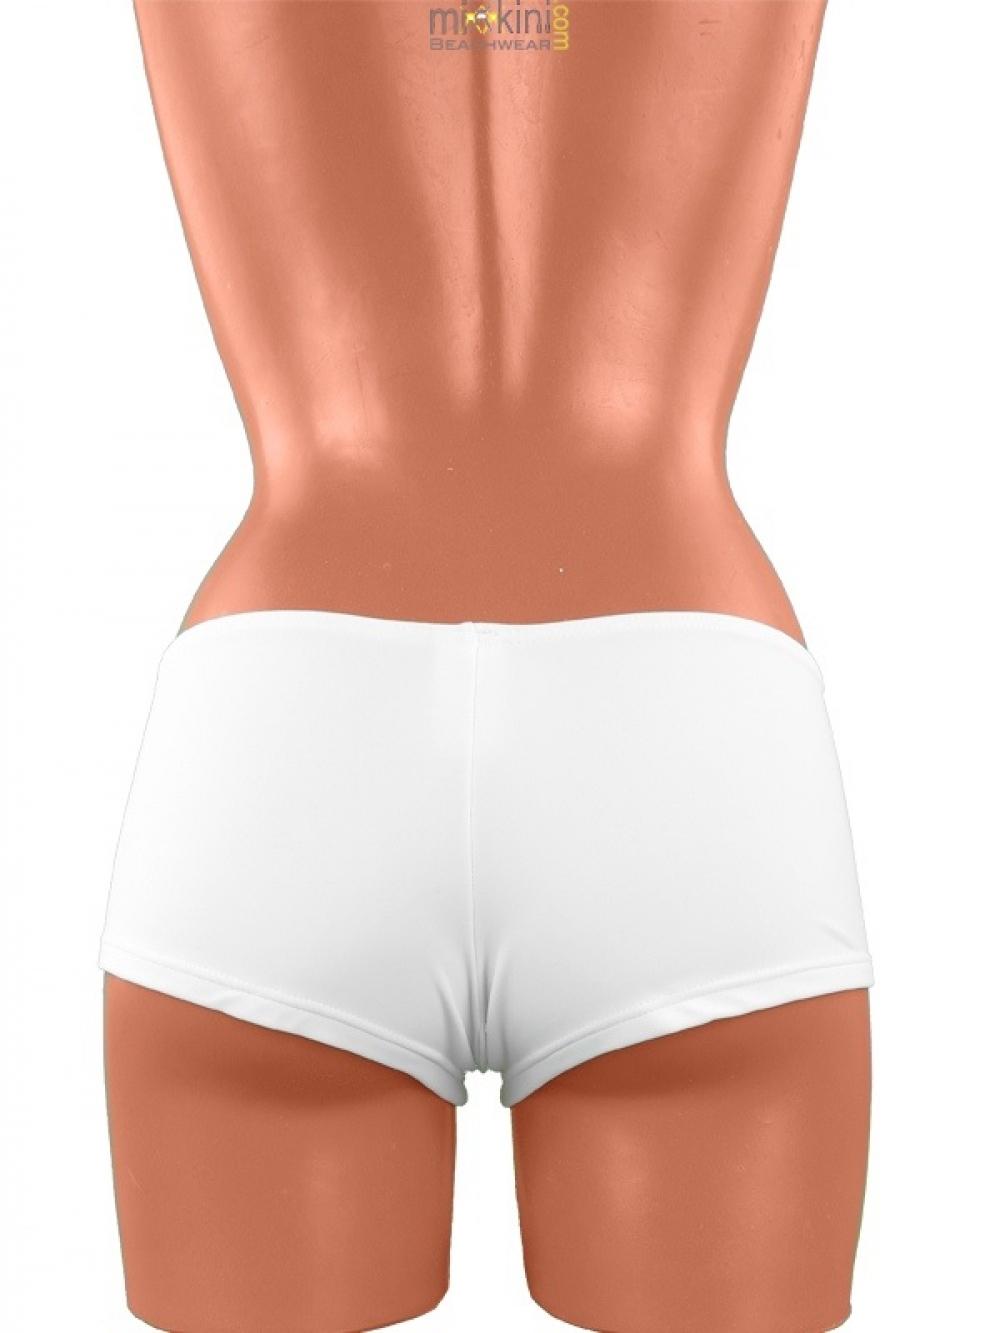 hotpant bikini in wei wei e bikini panty mixkini beachwear. Black Bedroom Furniture Sets. Home Design Ideas